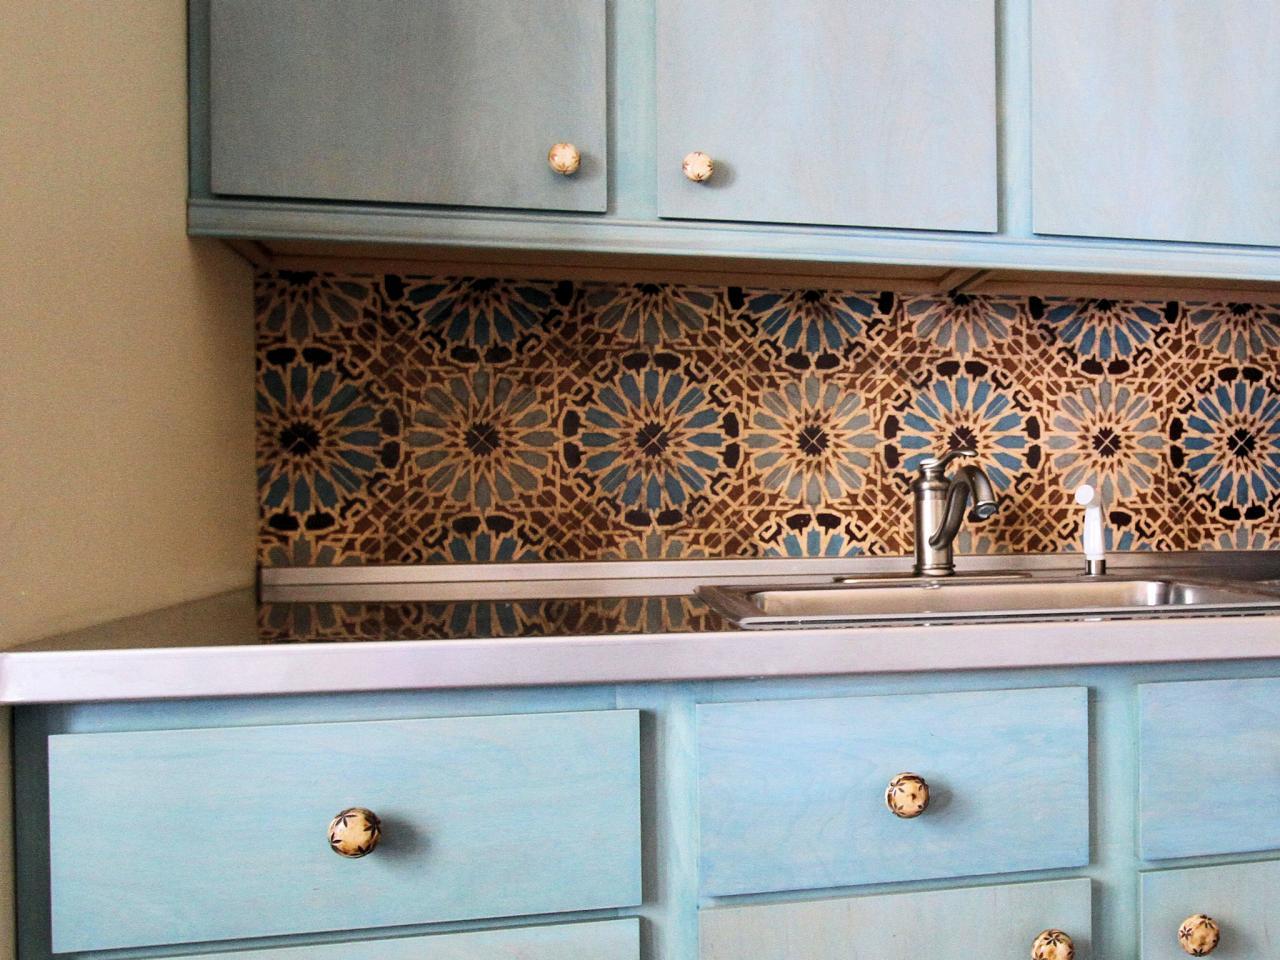 kitchen tile ideas kitchen tile backsplash ideas RNQMEPX